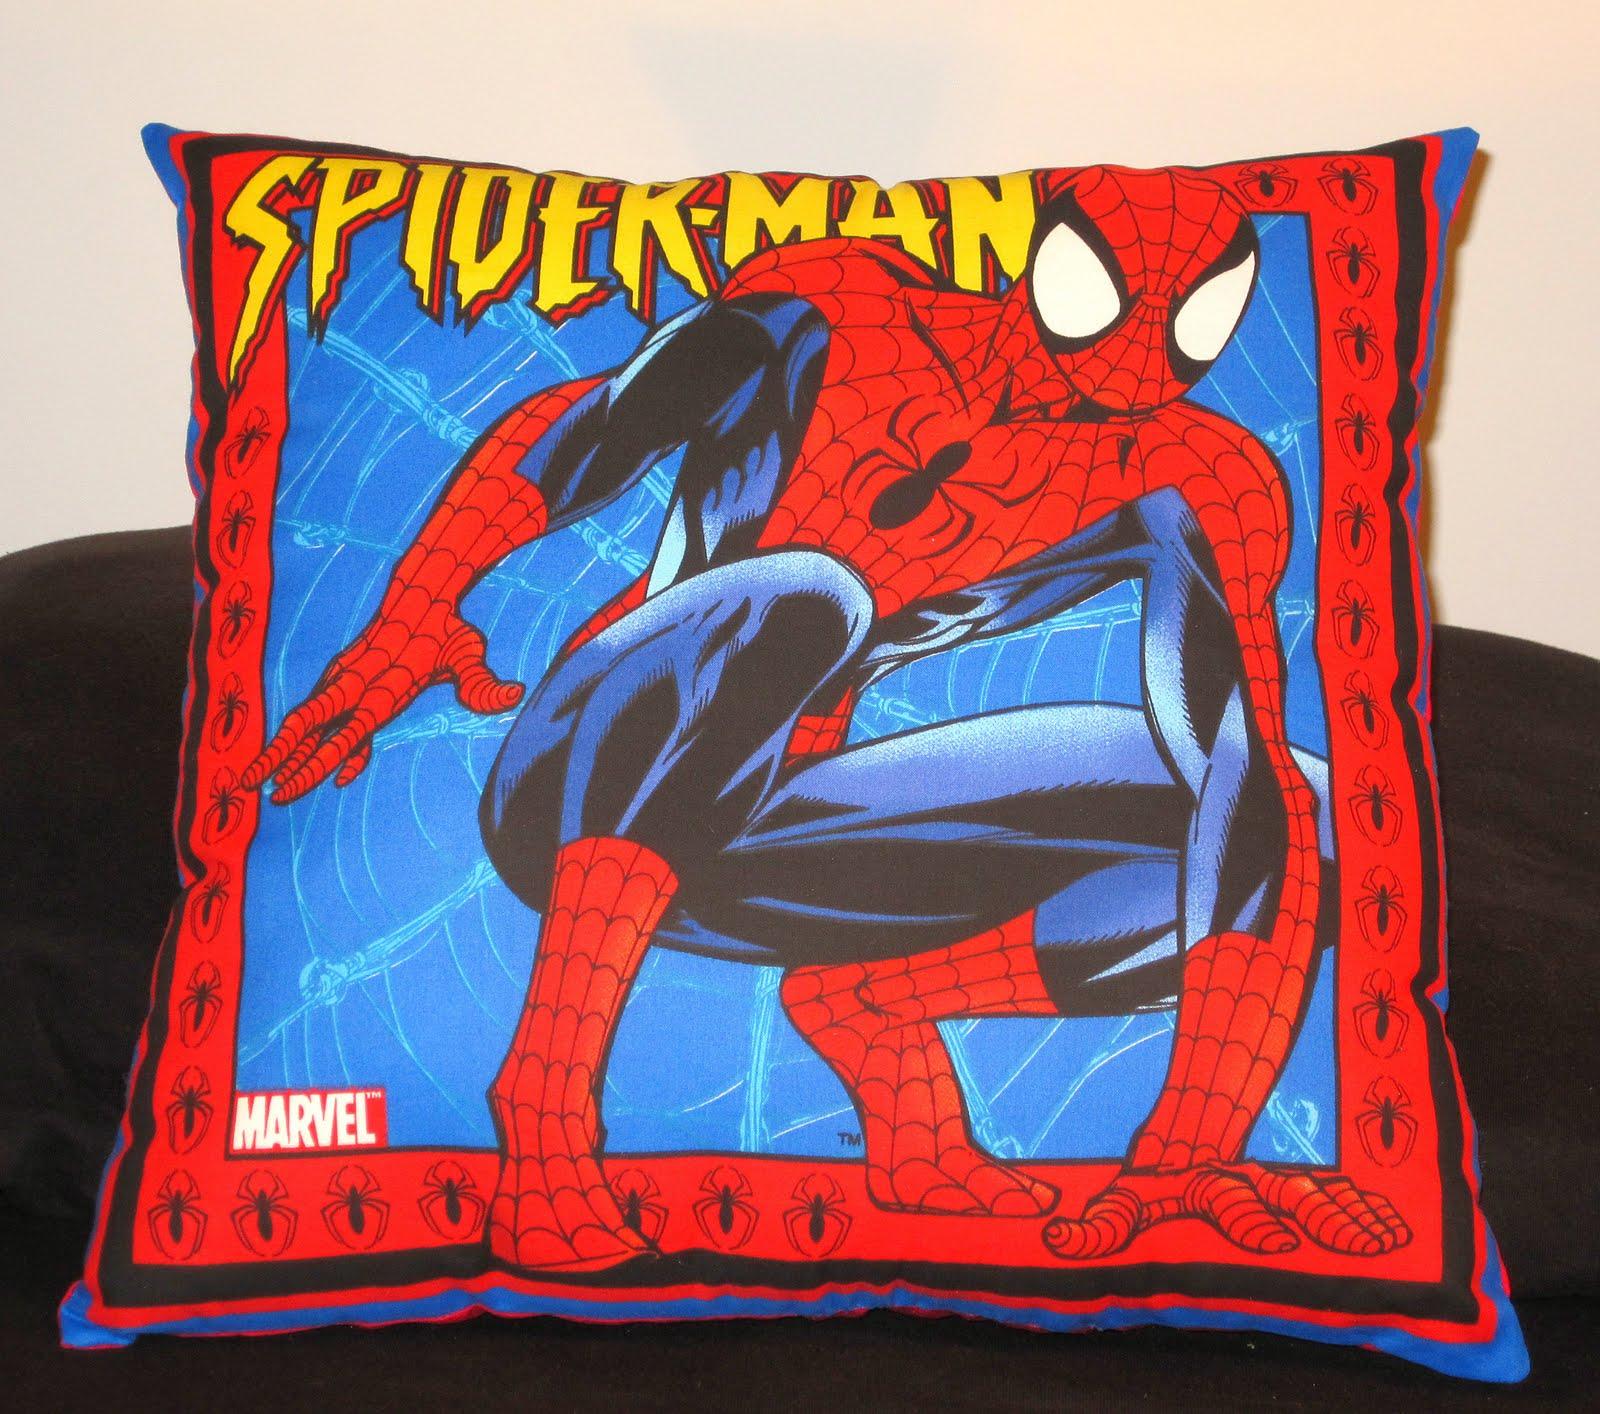 The 'Stache: Spiderman Swag